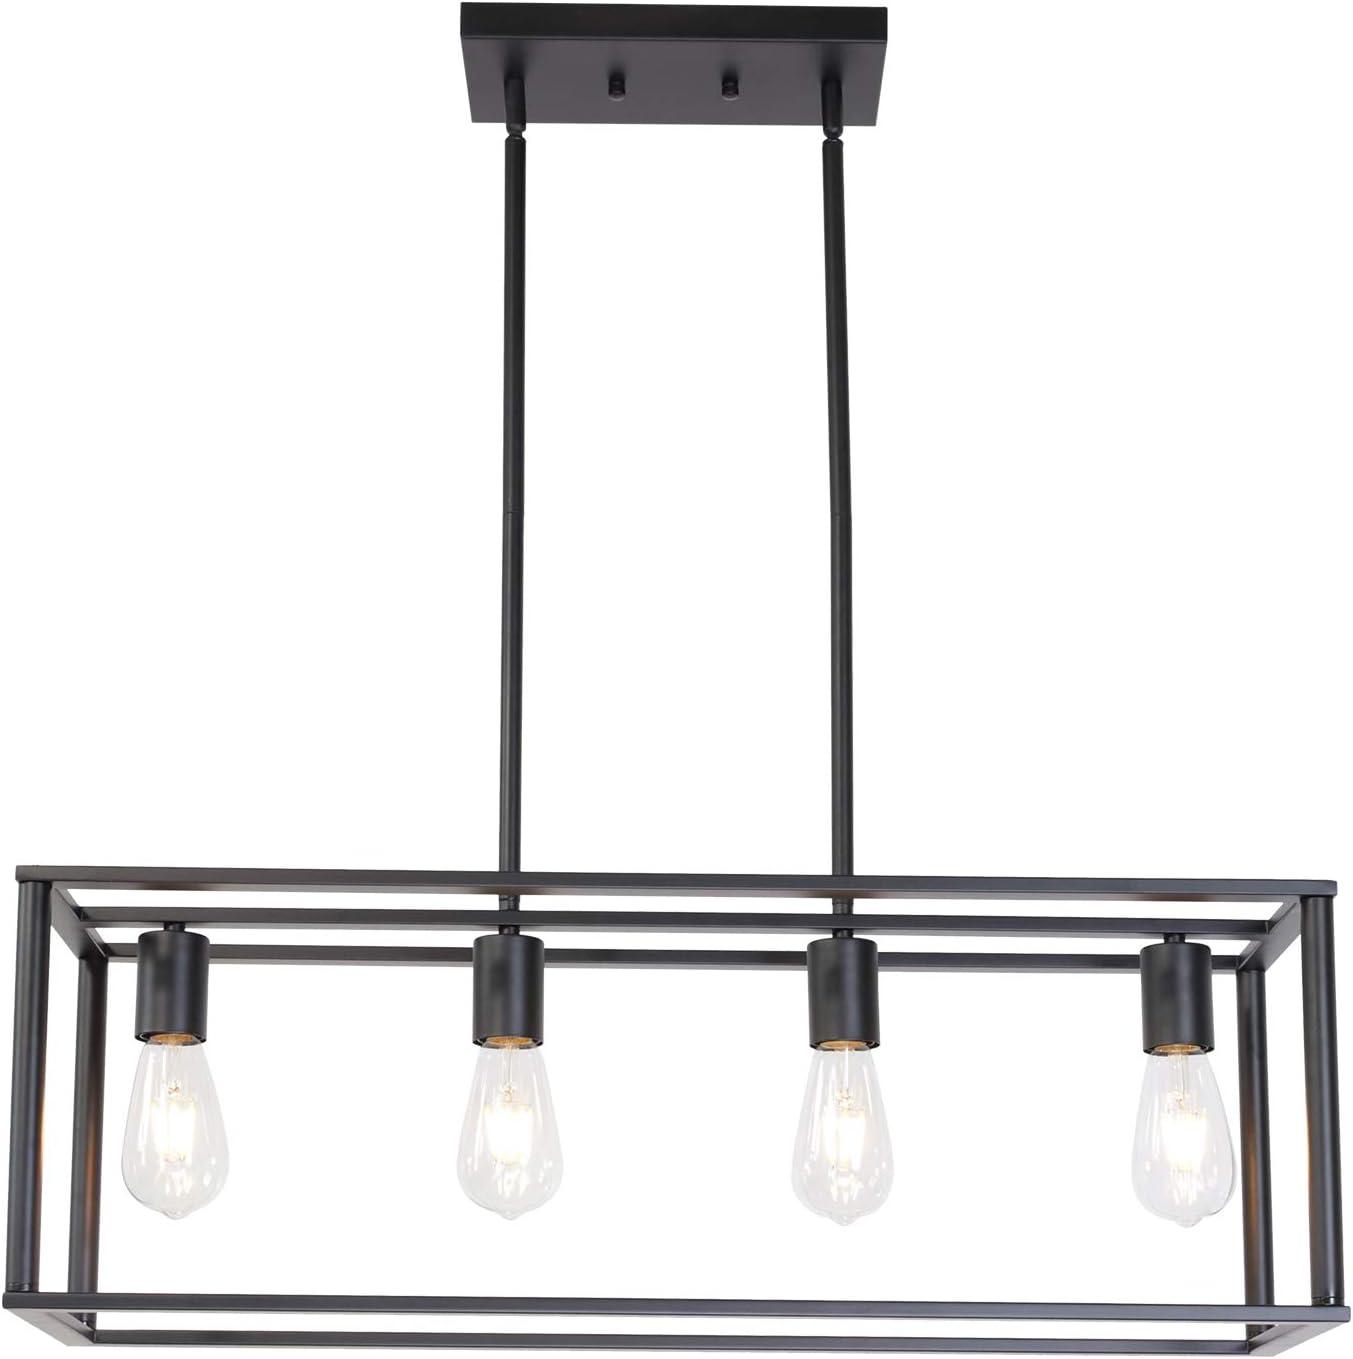 BONLICHT Kitchen Island Dining Room Pendant Lighting 4 Light Industrial Vintage Open Frame Rectangle Chandeliers Modern Black Linear Cage Ceiling Light Fixture for Farmhouse Cafe Bar Restaurant